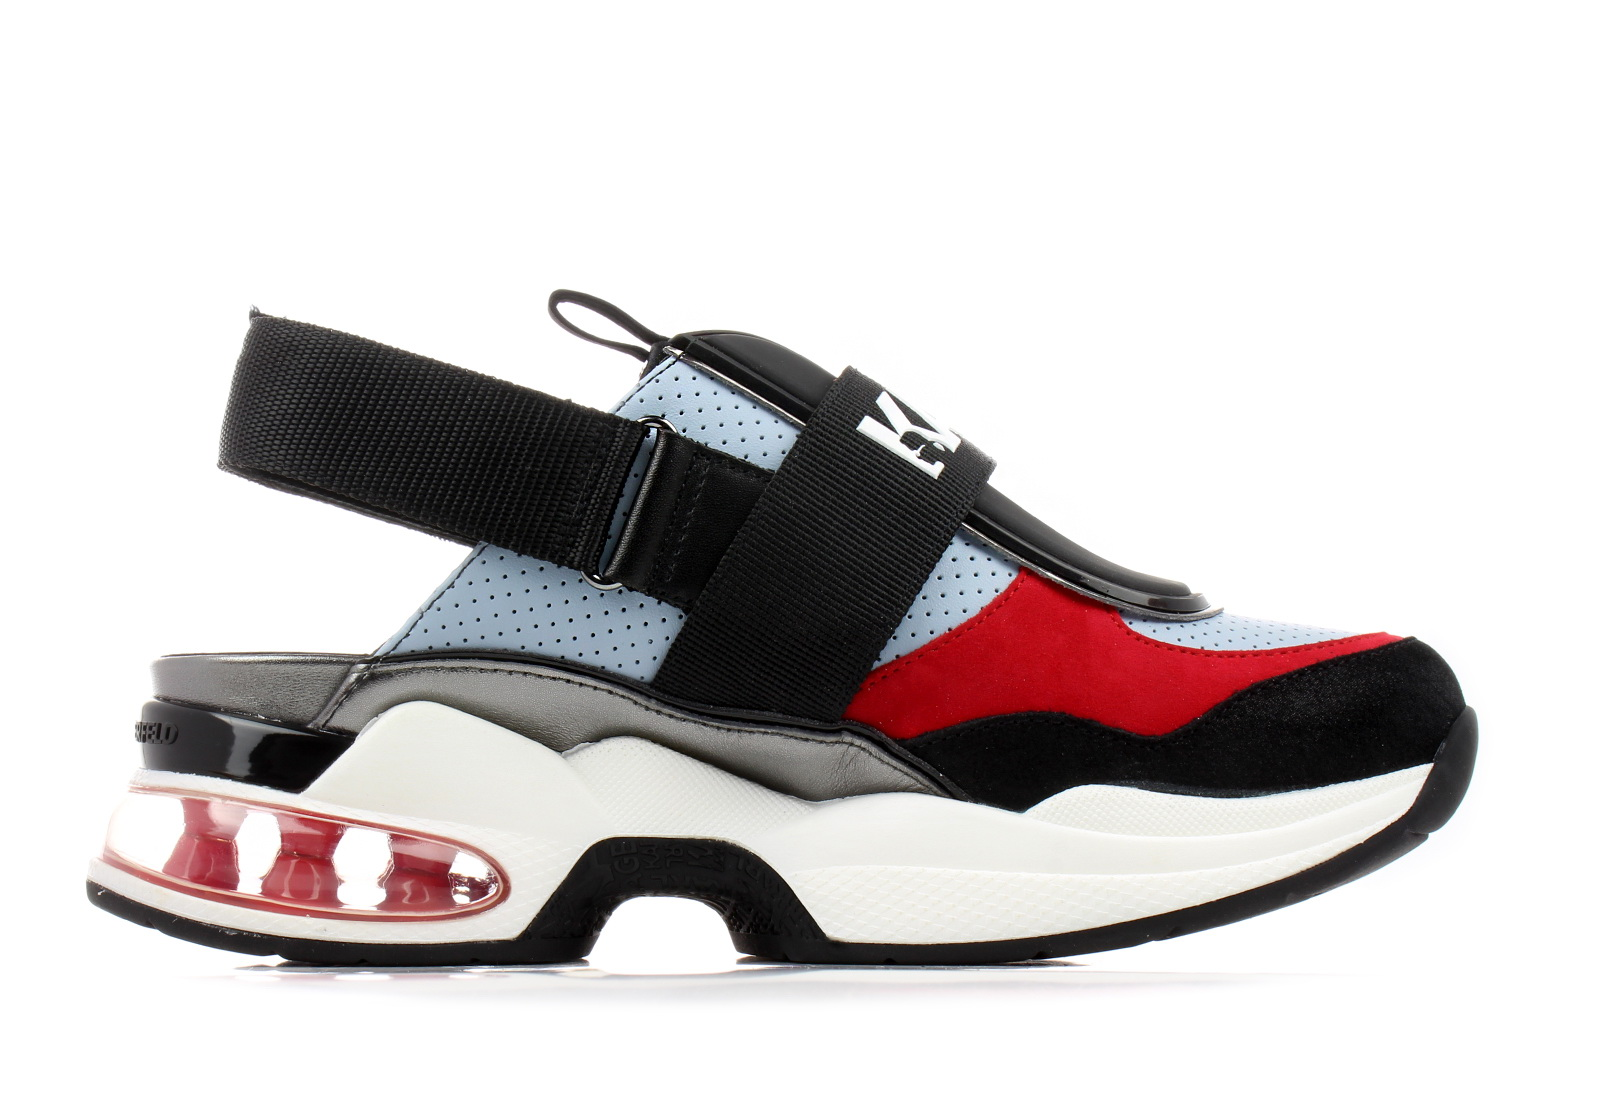 c25320a42c Karl Lagerfeld Cipő - Ventura Shuttle - KL61710-3XB - Office Shoes ...